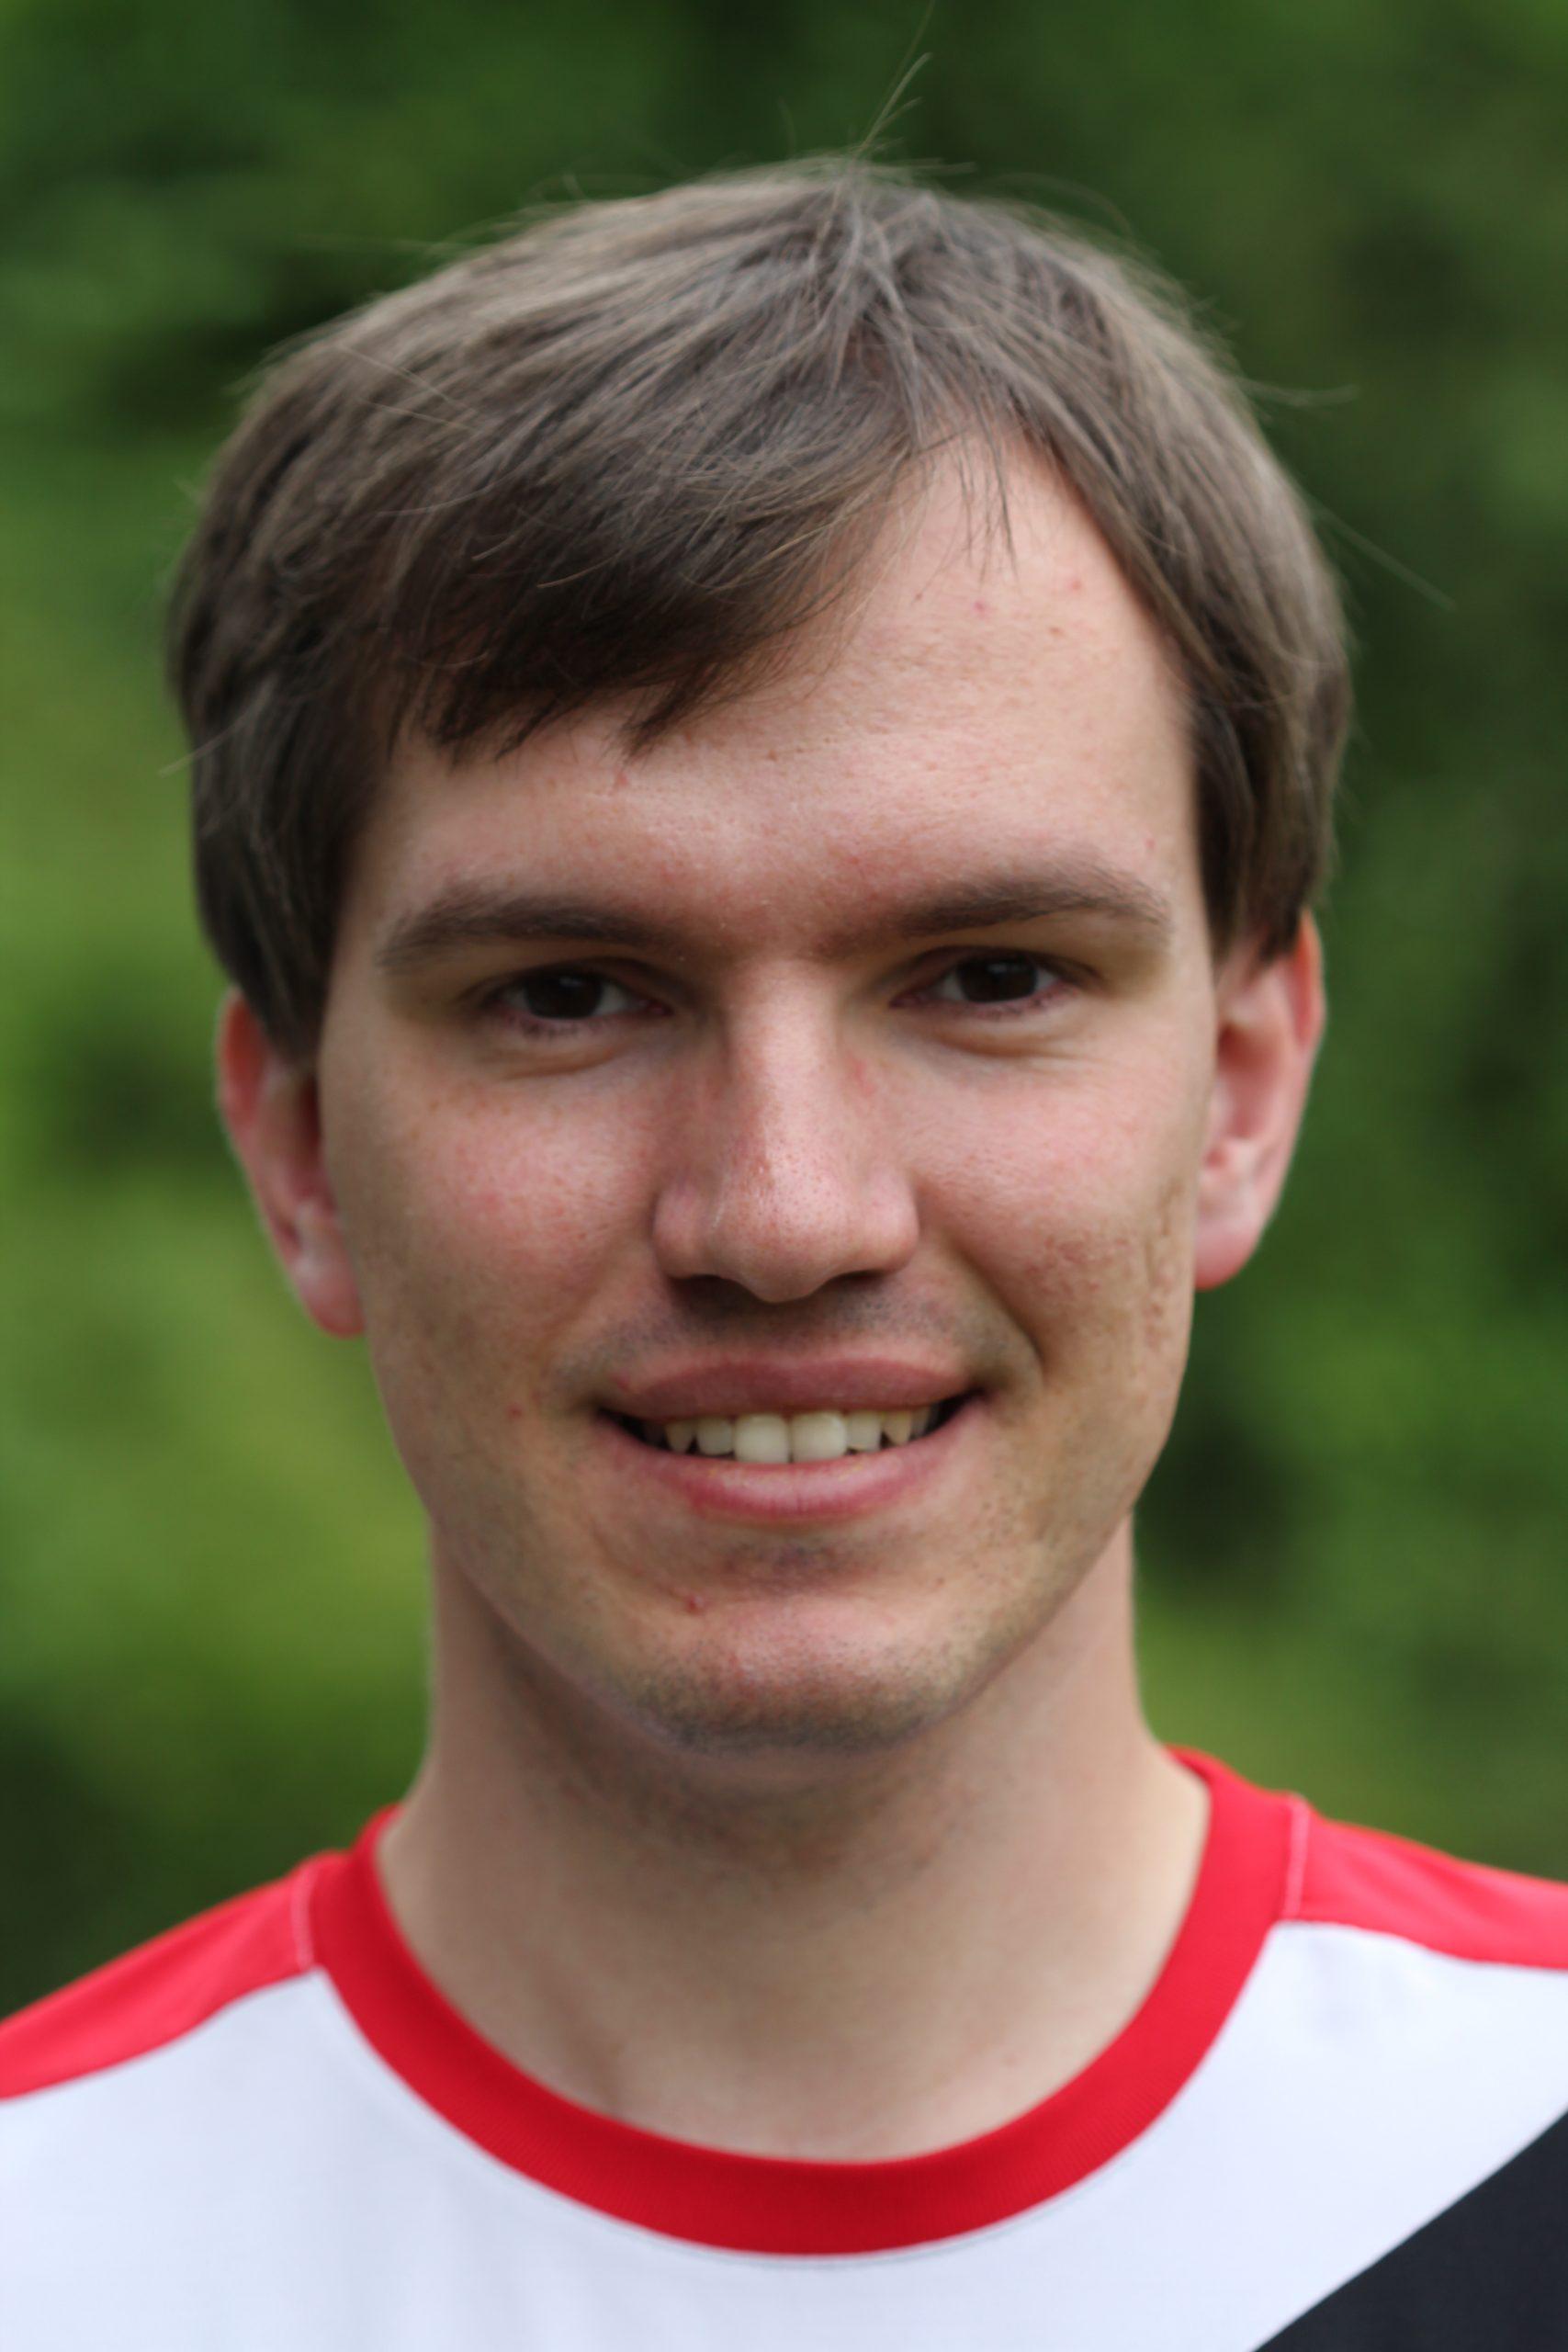 Christian Eimermacher